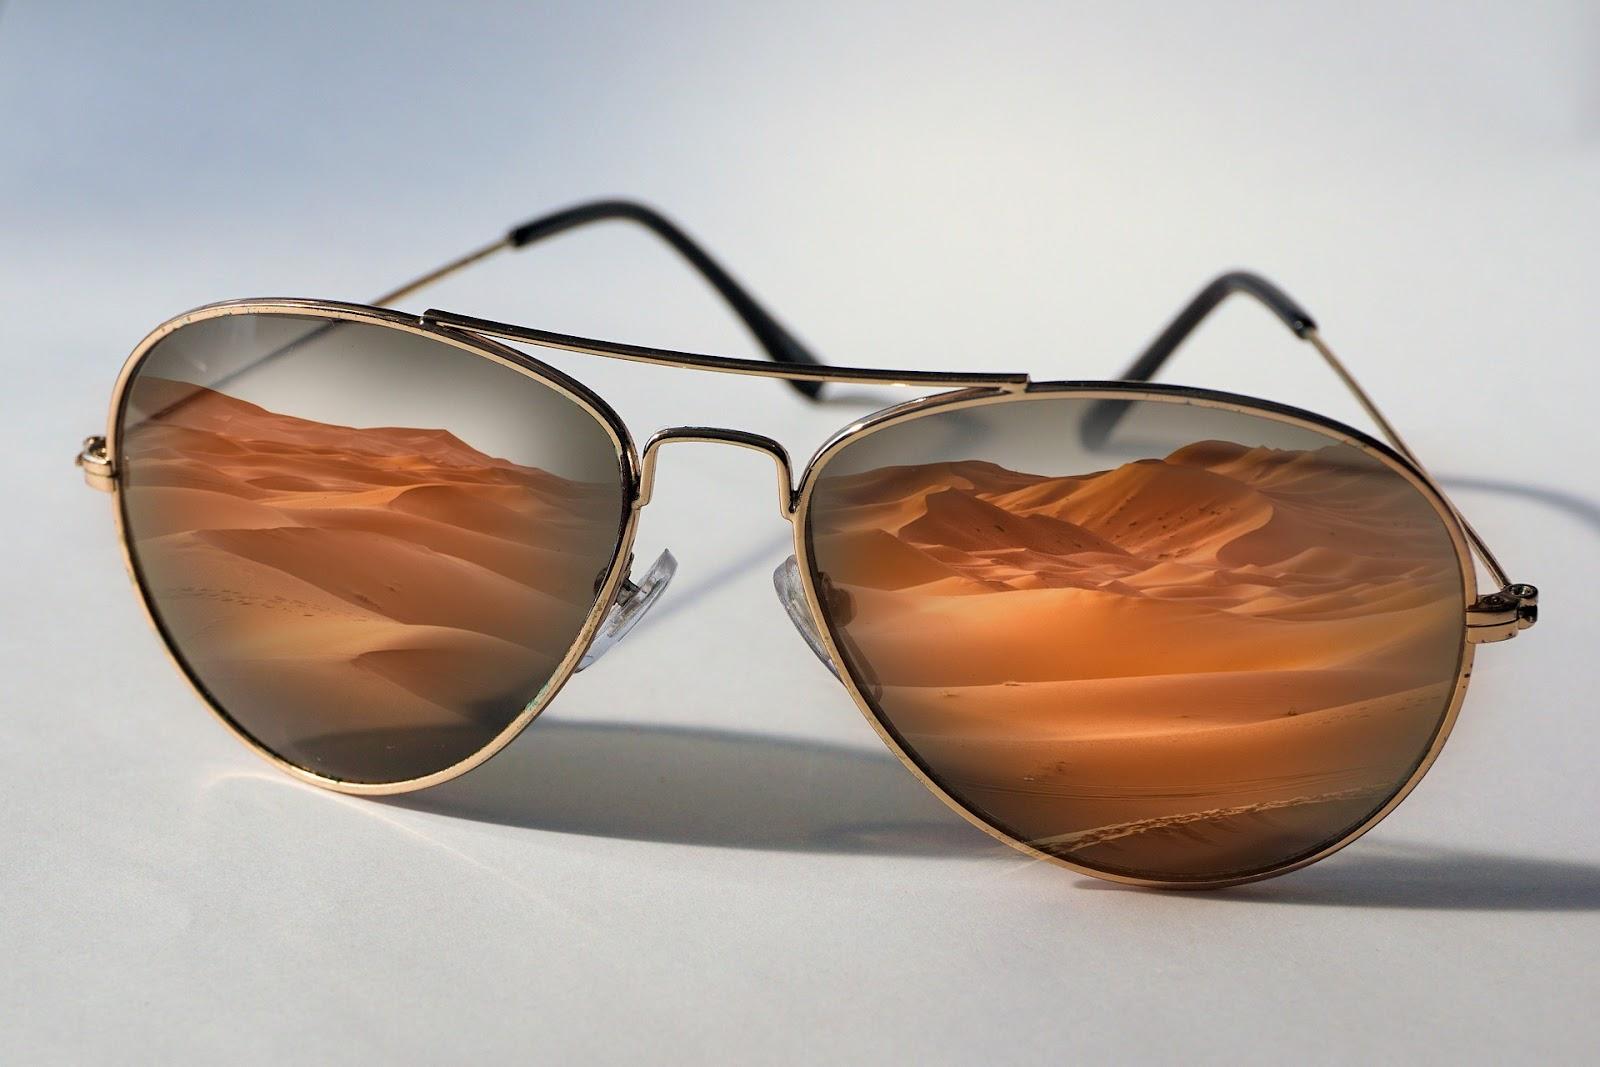 sunglasses-1382261_1920.jpg